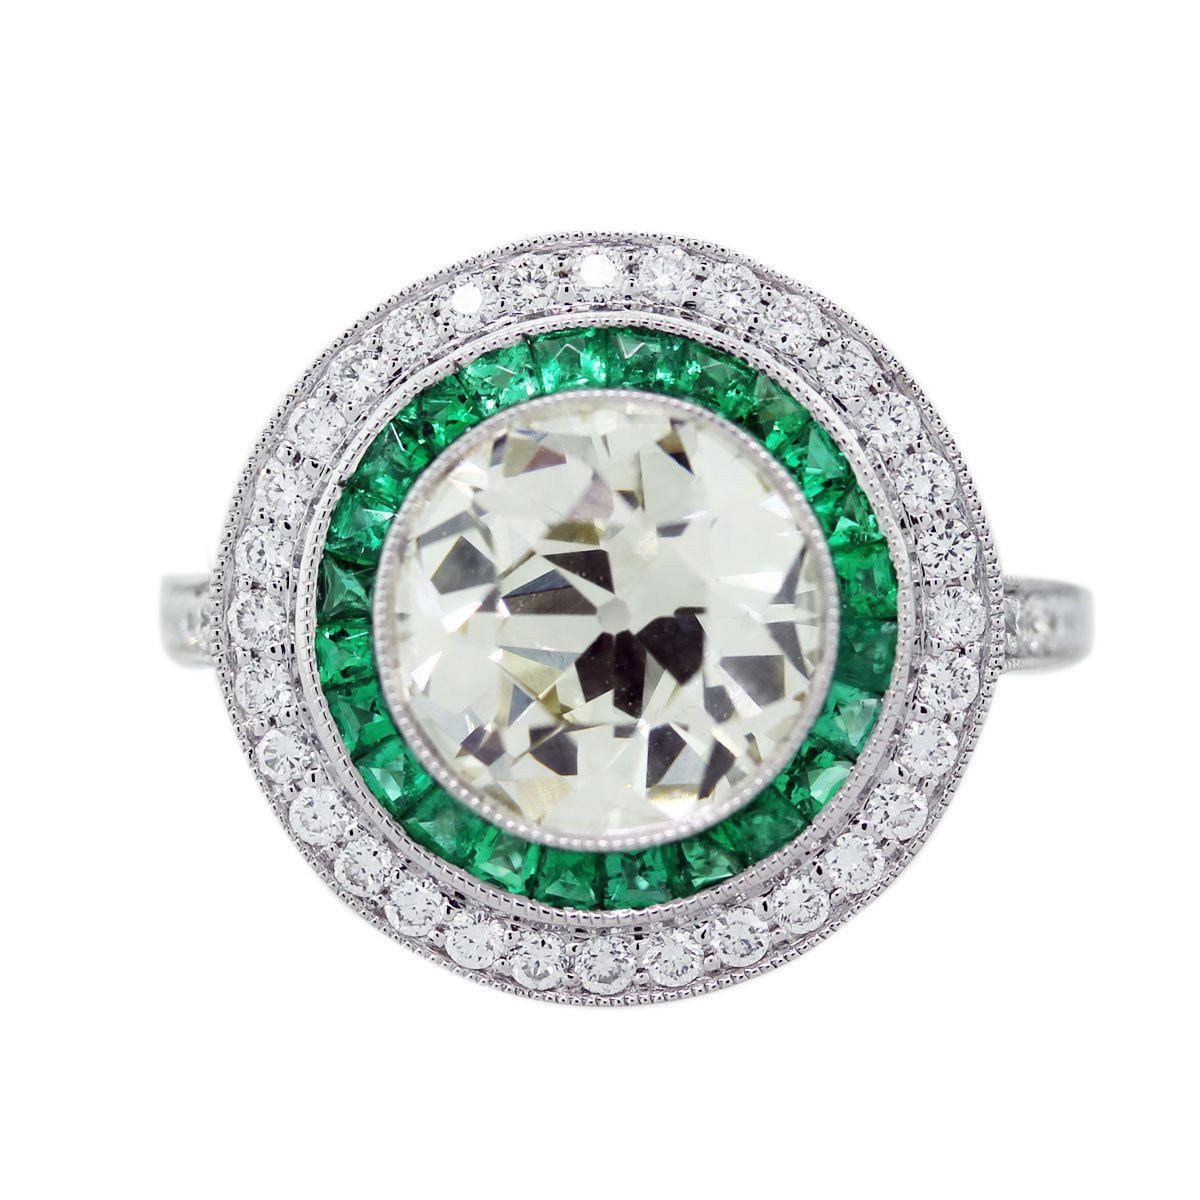 emerald and engagement ring gemstone halo